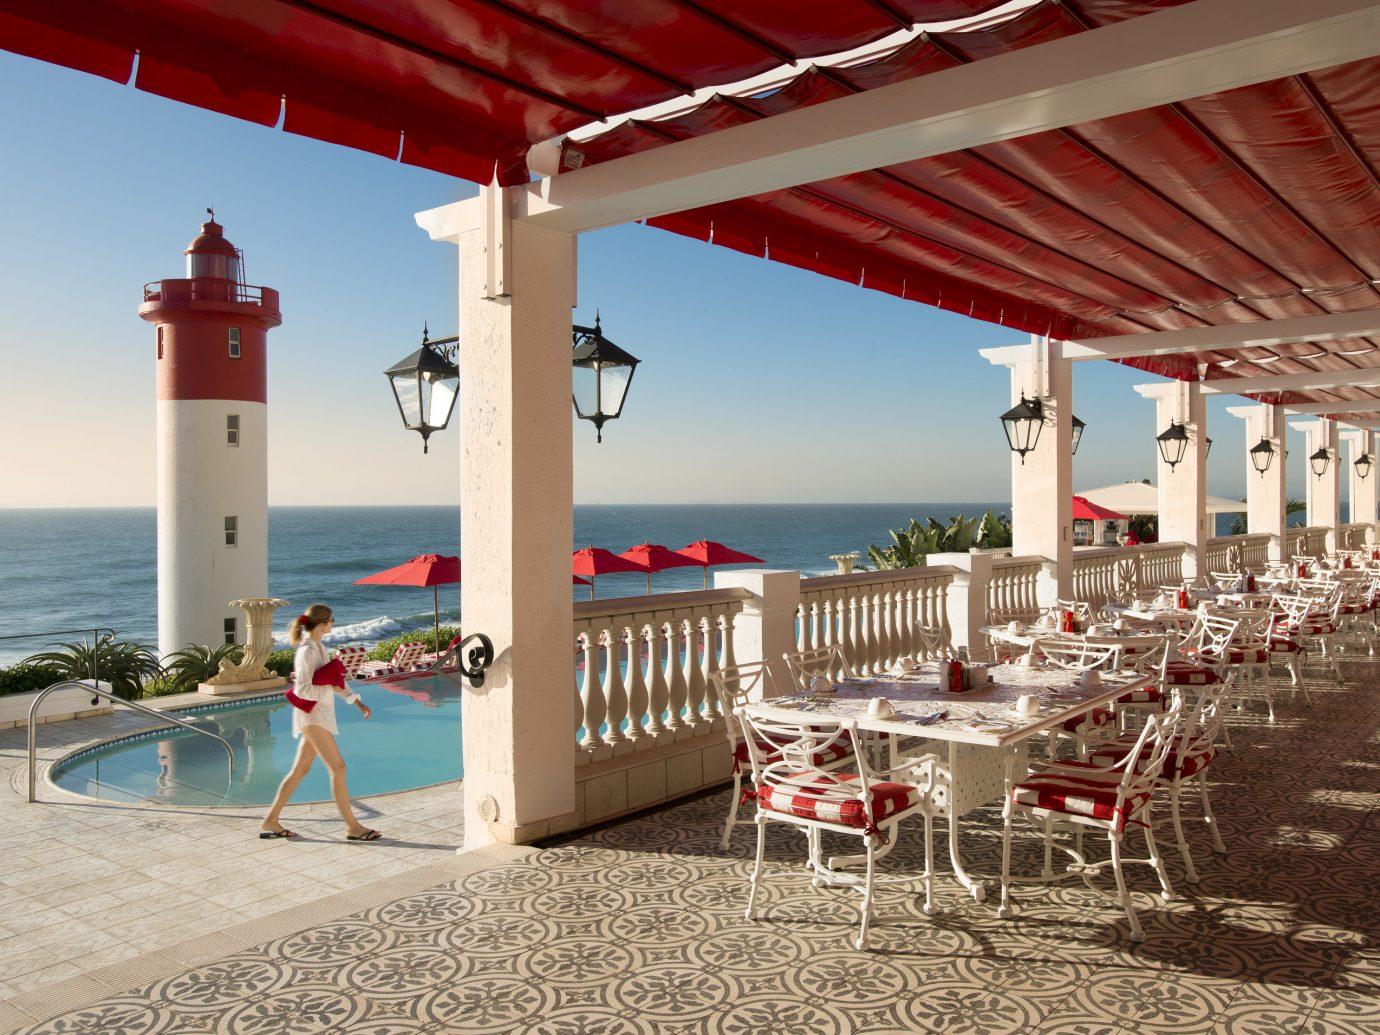 Hotels sky ground leisure walkway vacation Beach estate